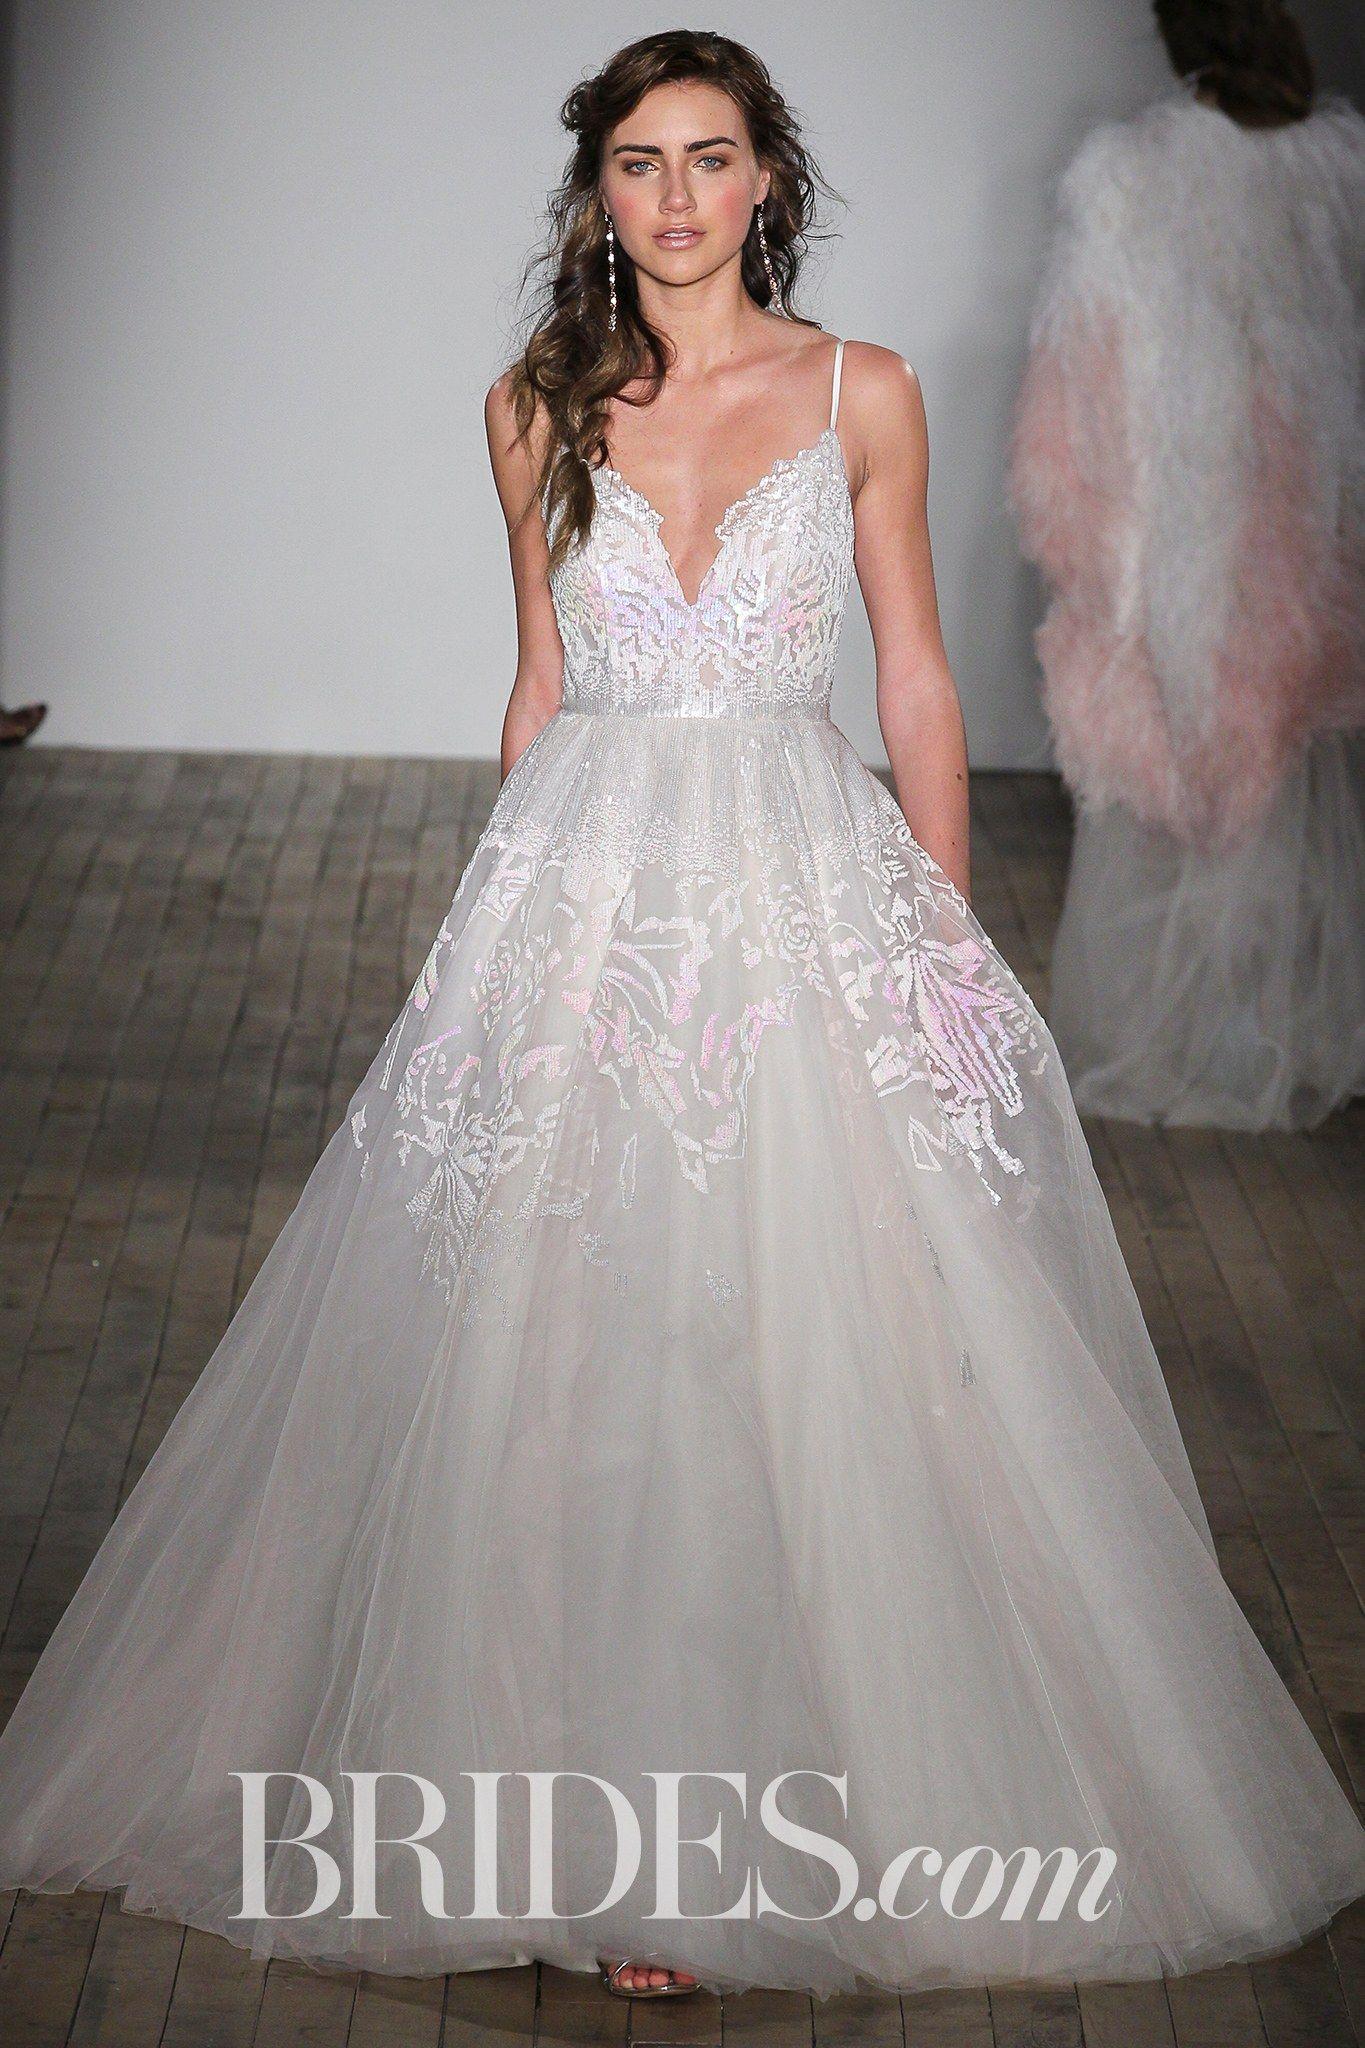 Hayley Paige Wedding Dresses By Season Hayley Paige Wedding Dress Colored Wedding Dresses Wedding Dress Styles [ 2048 x 1365 Pixel ]